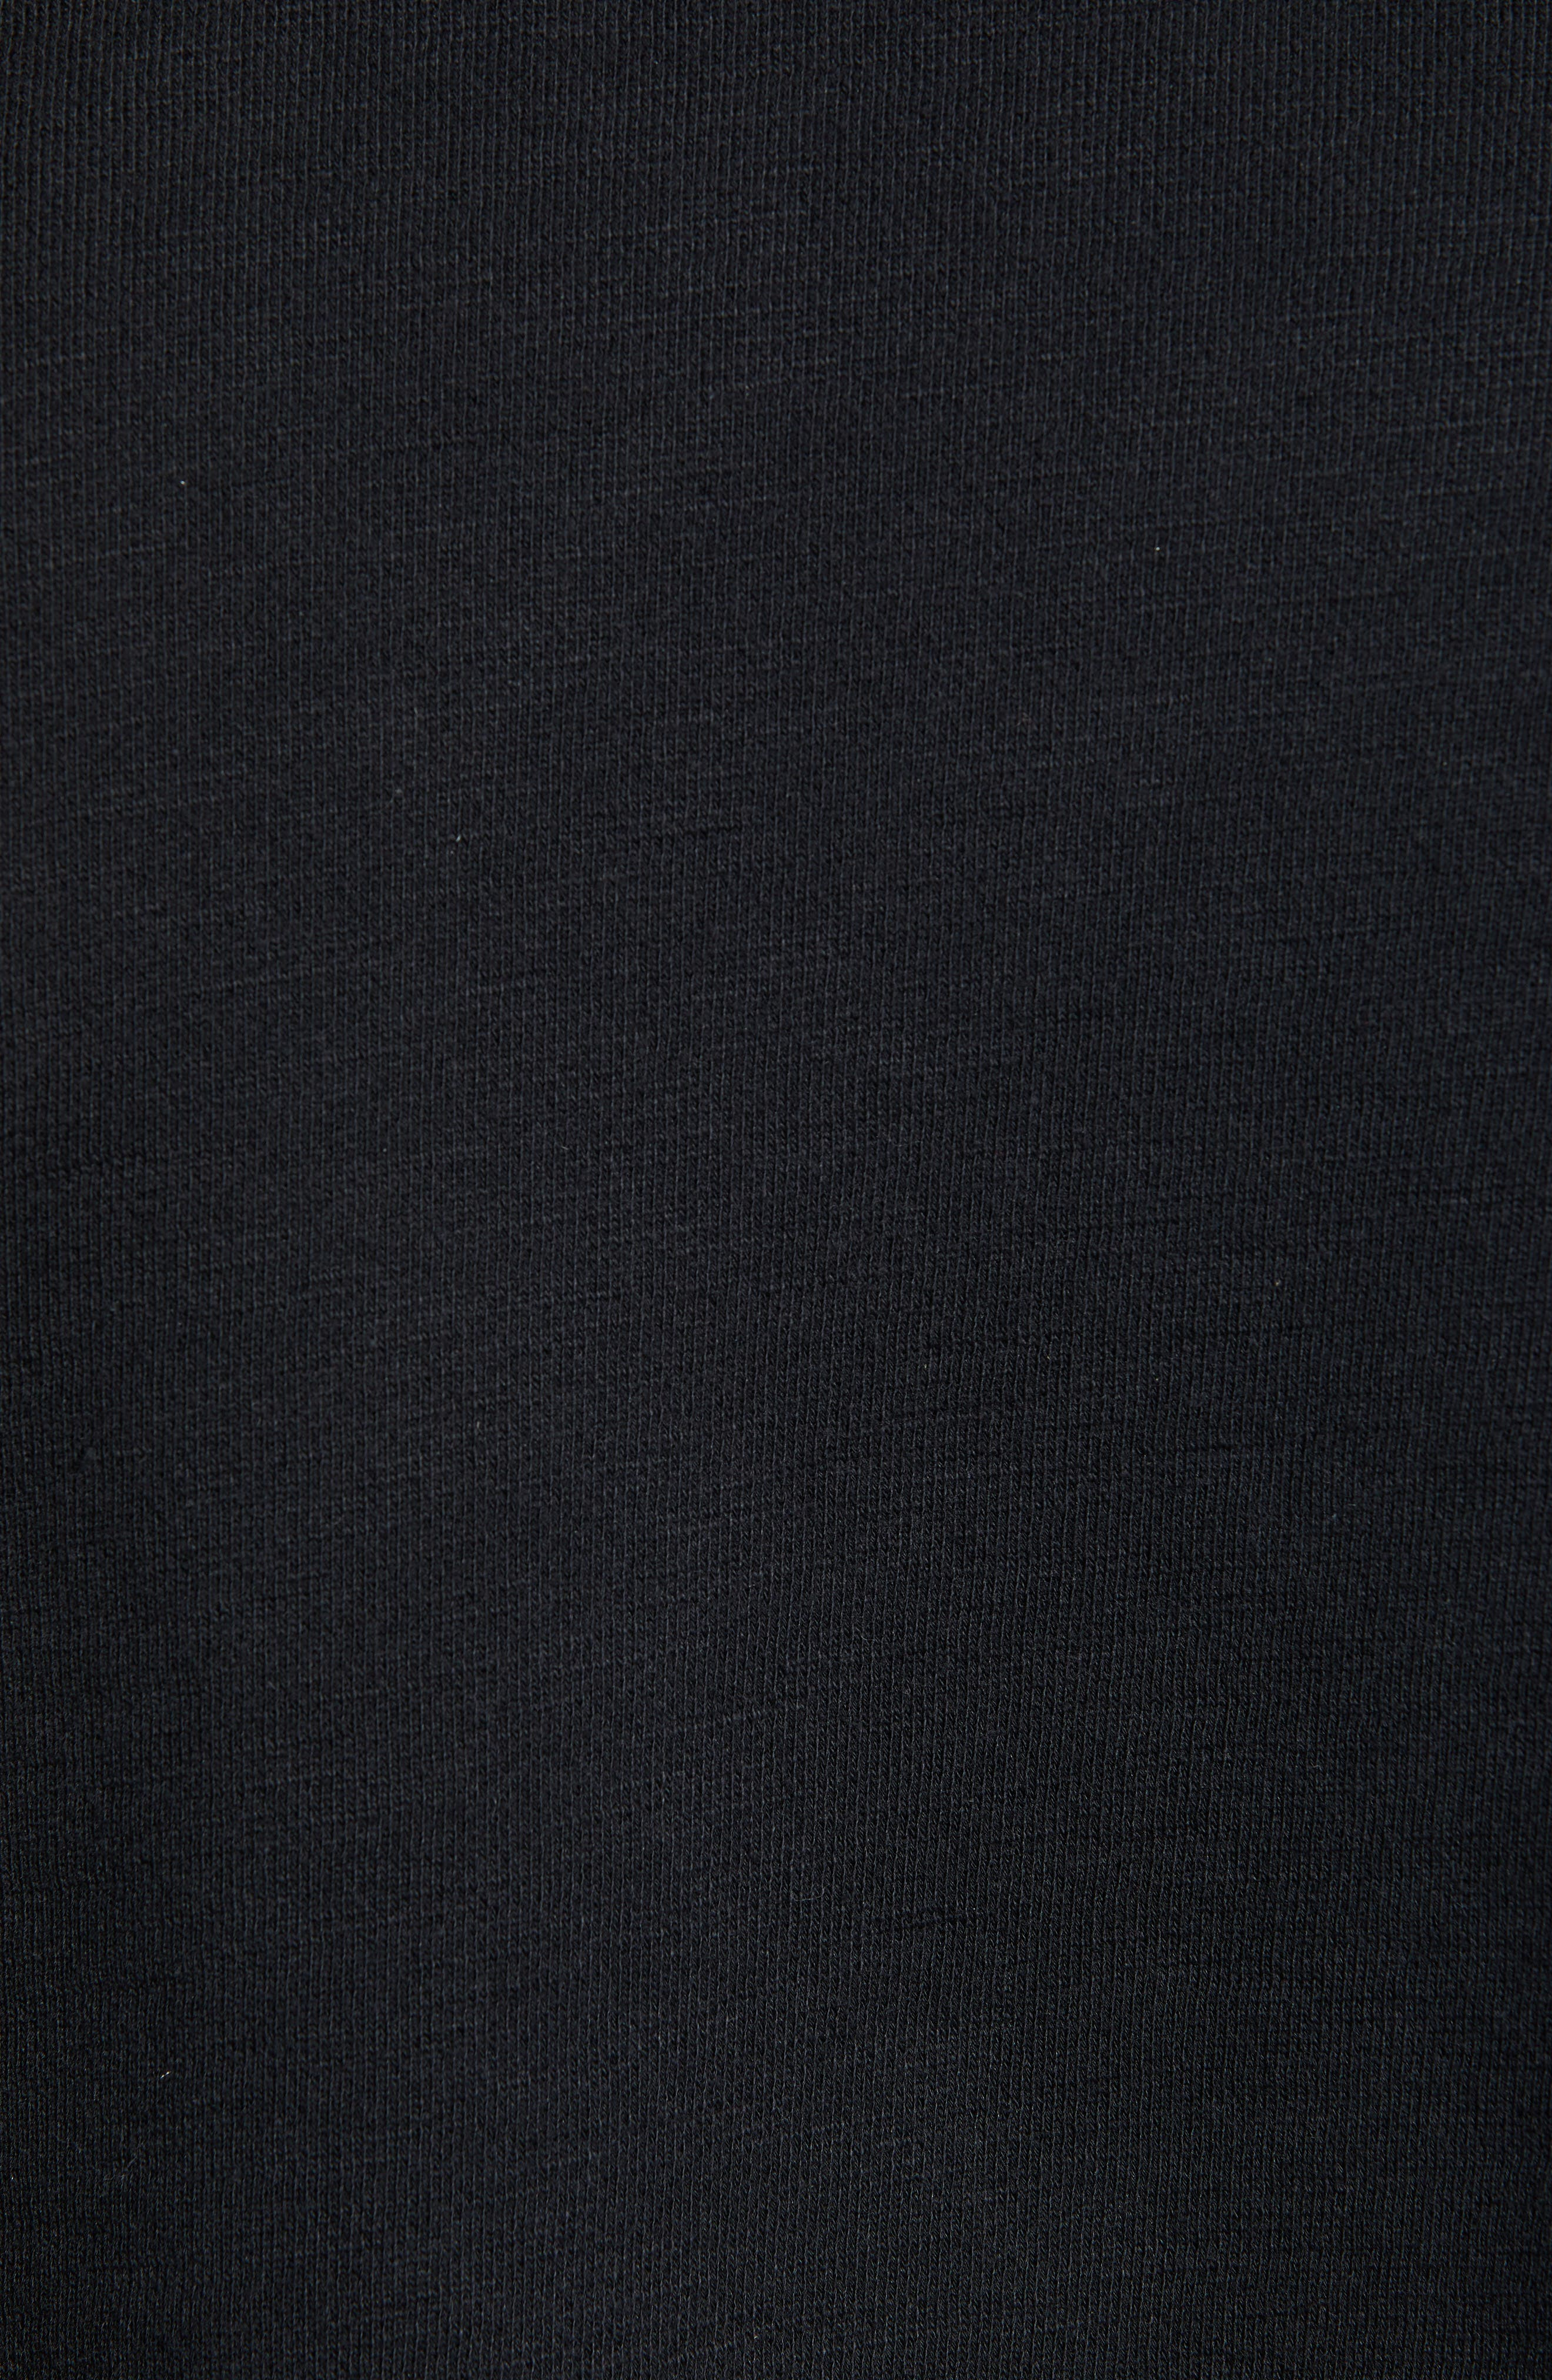 RAG & BONE, Year of the Pig Graphic Sweatshirt, Alternate thumbnail 5, color, BLACK